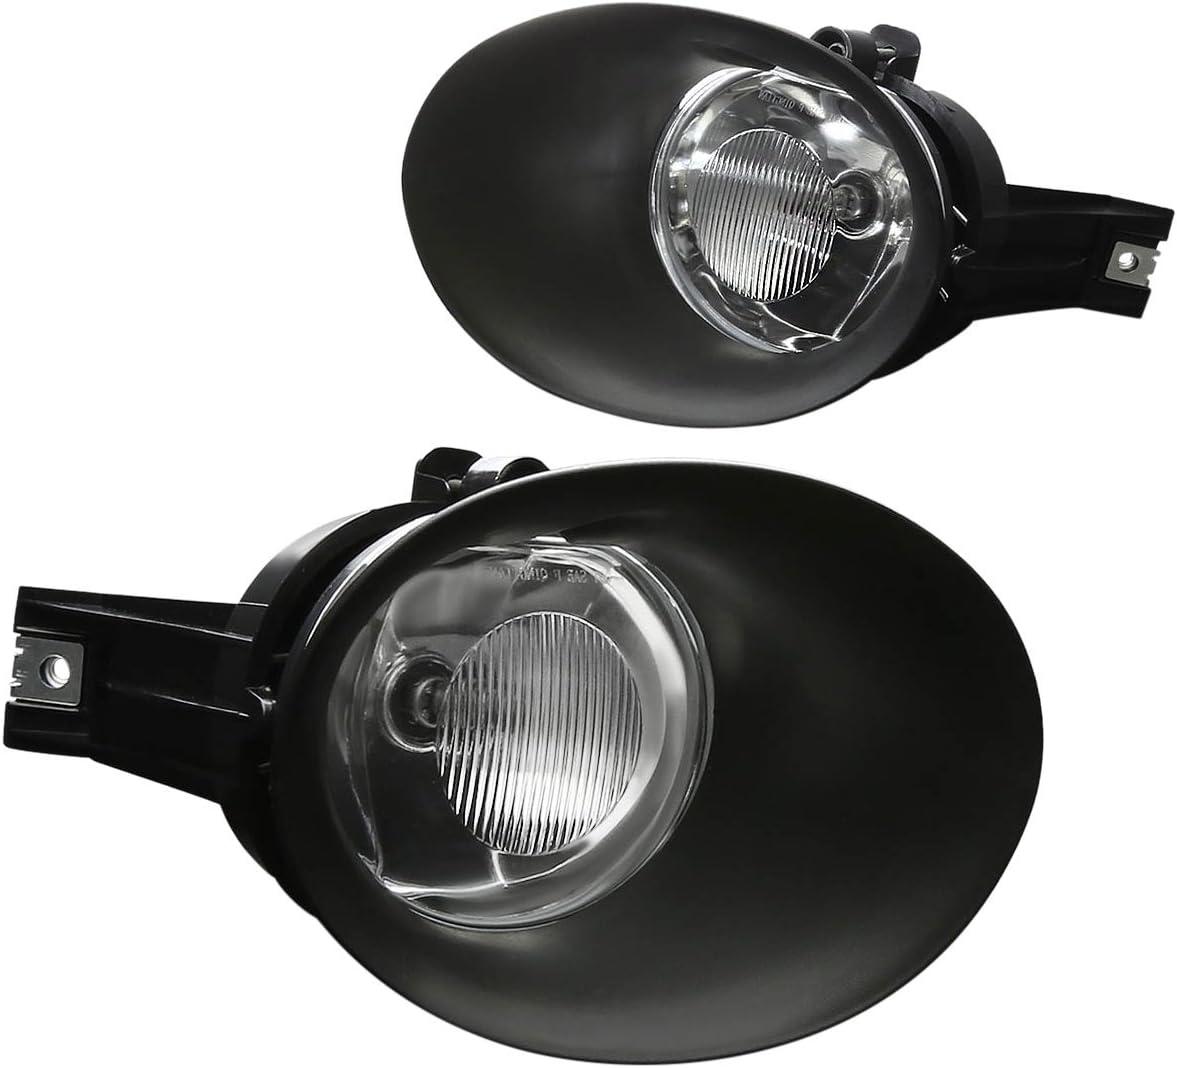 DNA Motoring FL-ZTL-287-CH Front Bumper High Power LED Fog Light Lamp Set w//Bezel Cover+Switch,Clear Lens